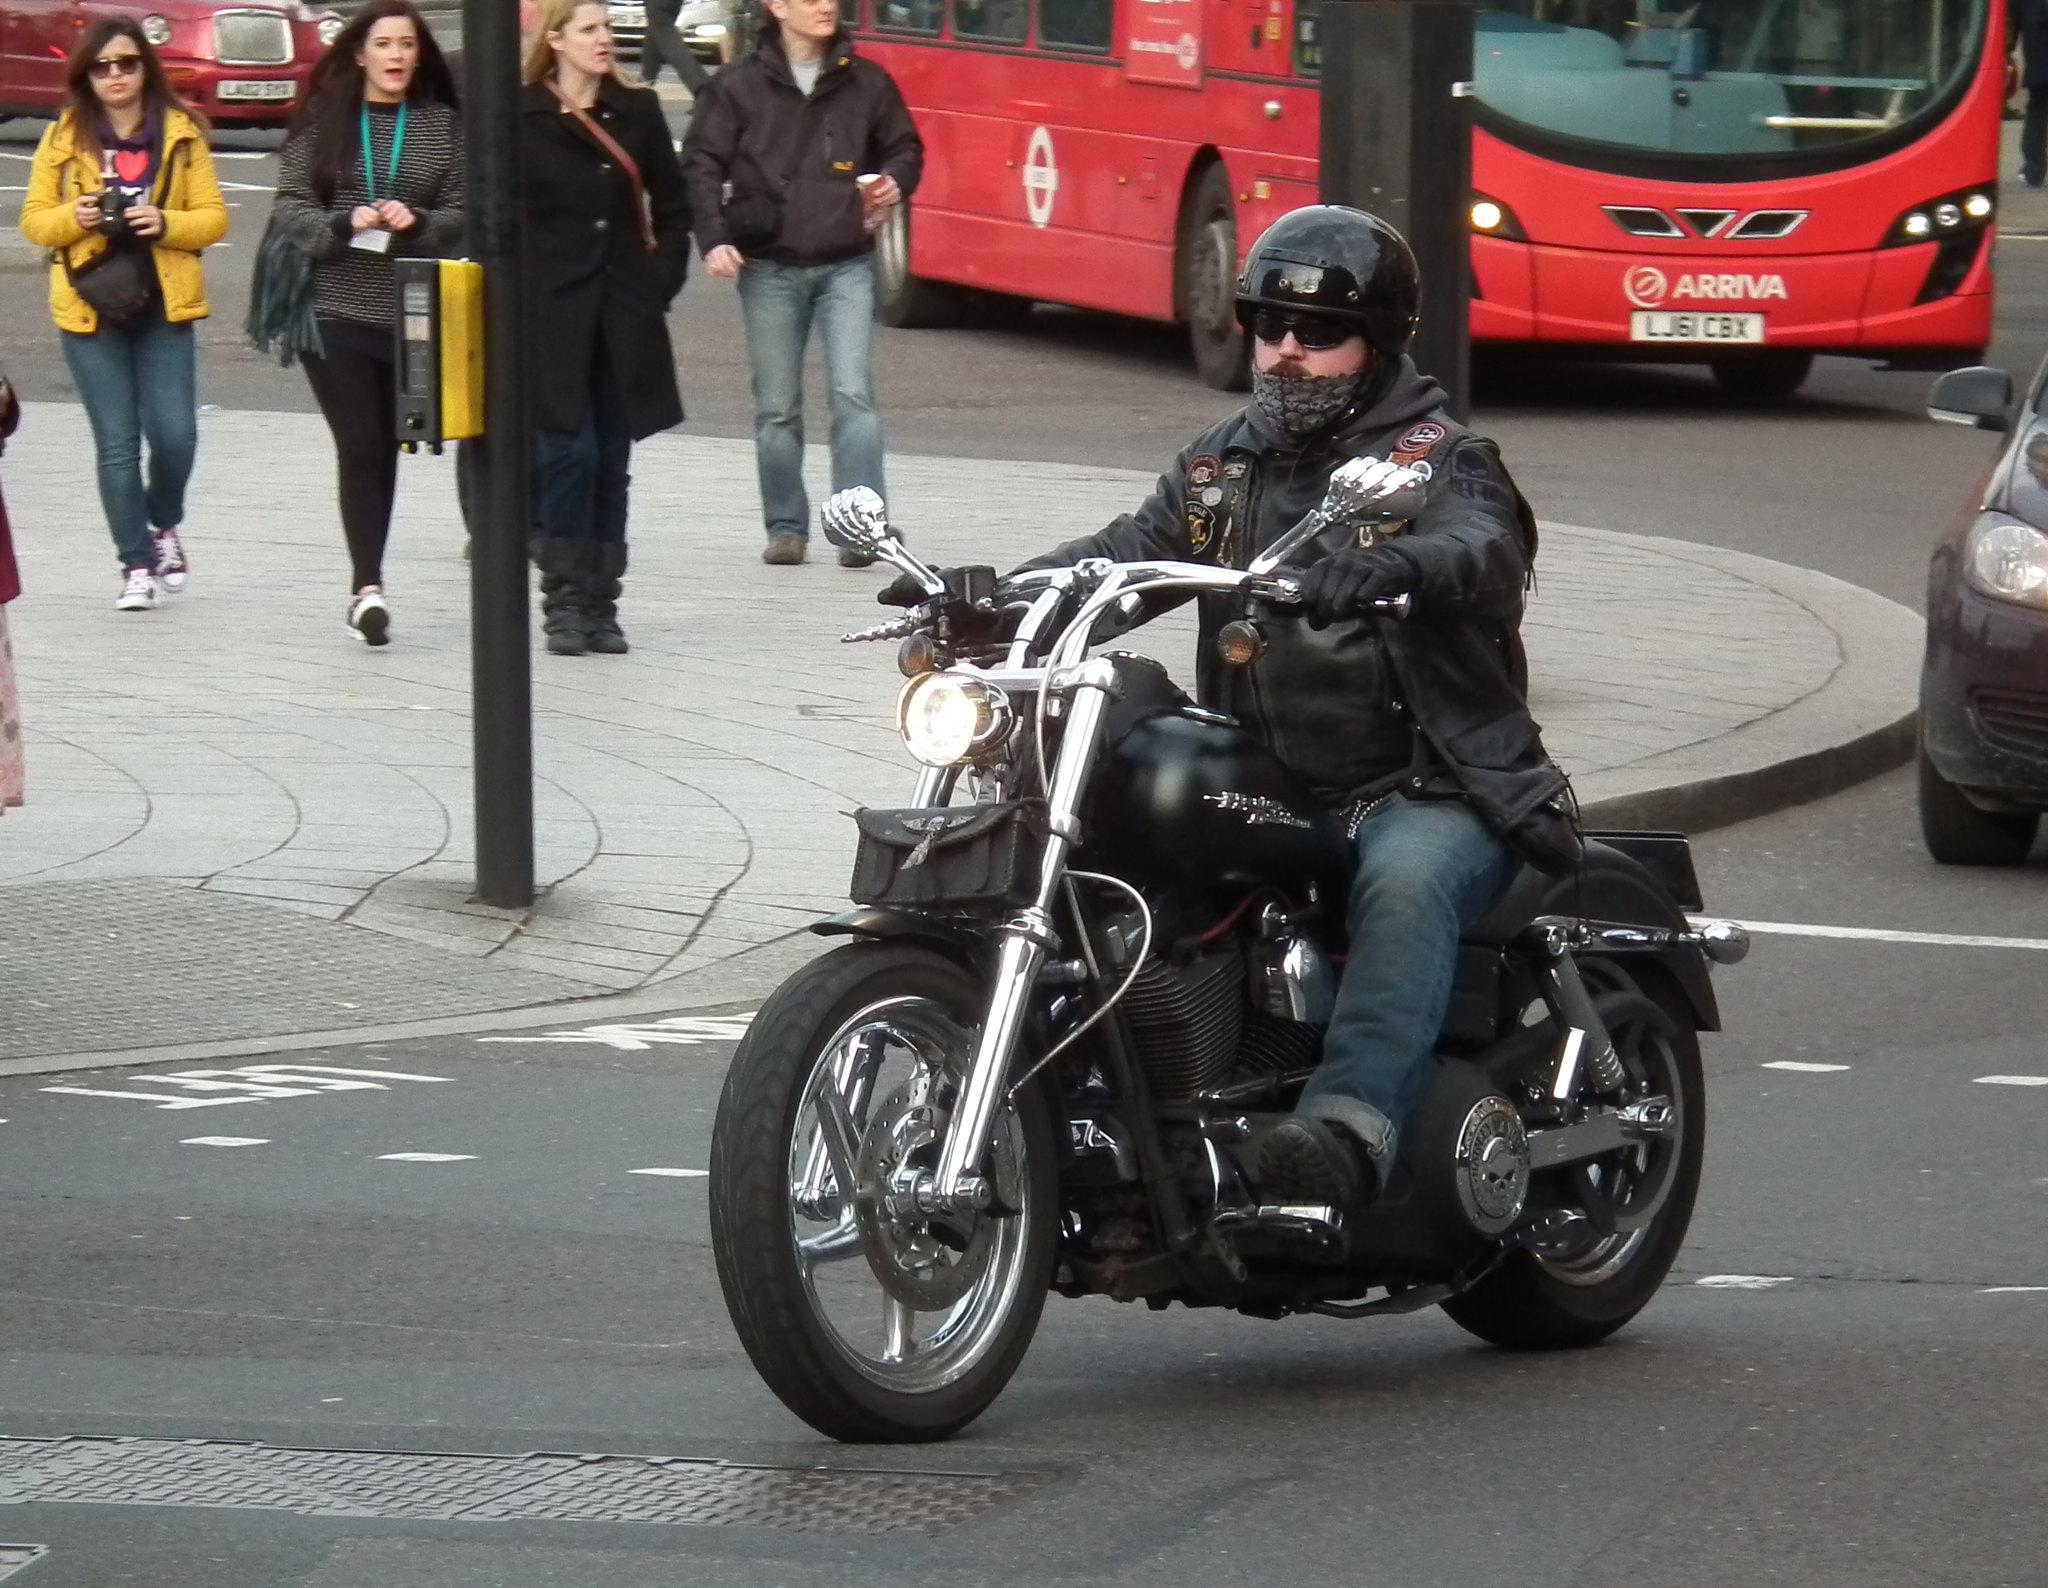 Harley Davidson Fxdb Dyna Street Bob Motorcycle